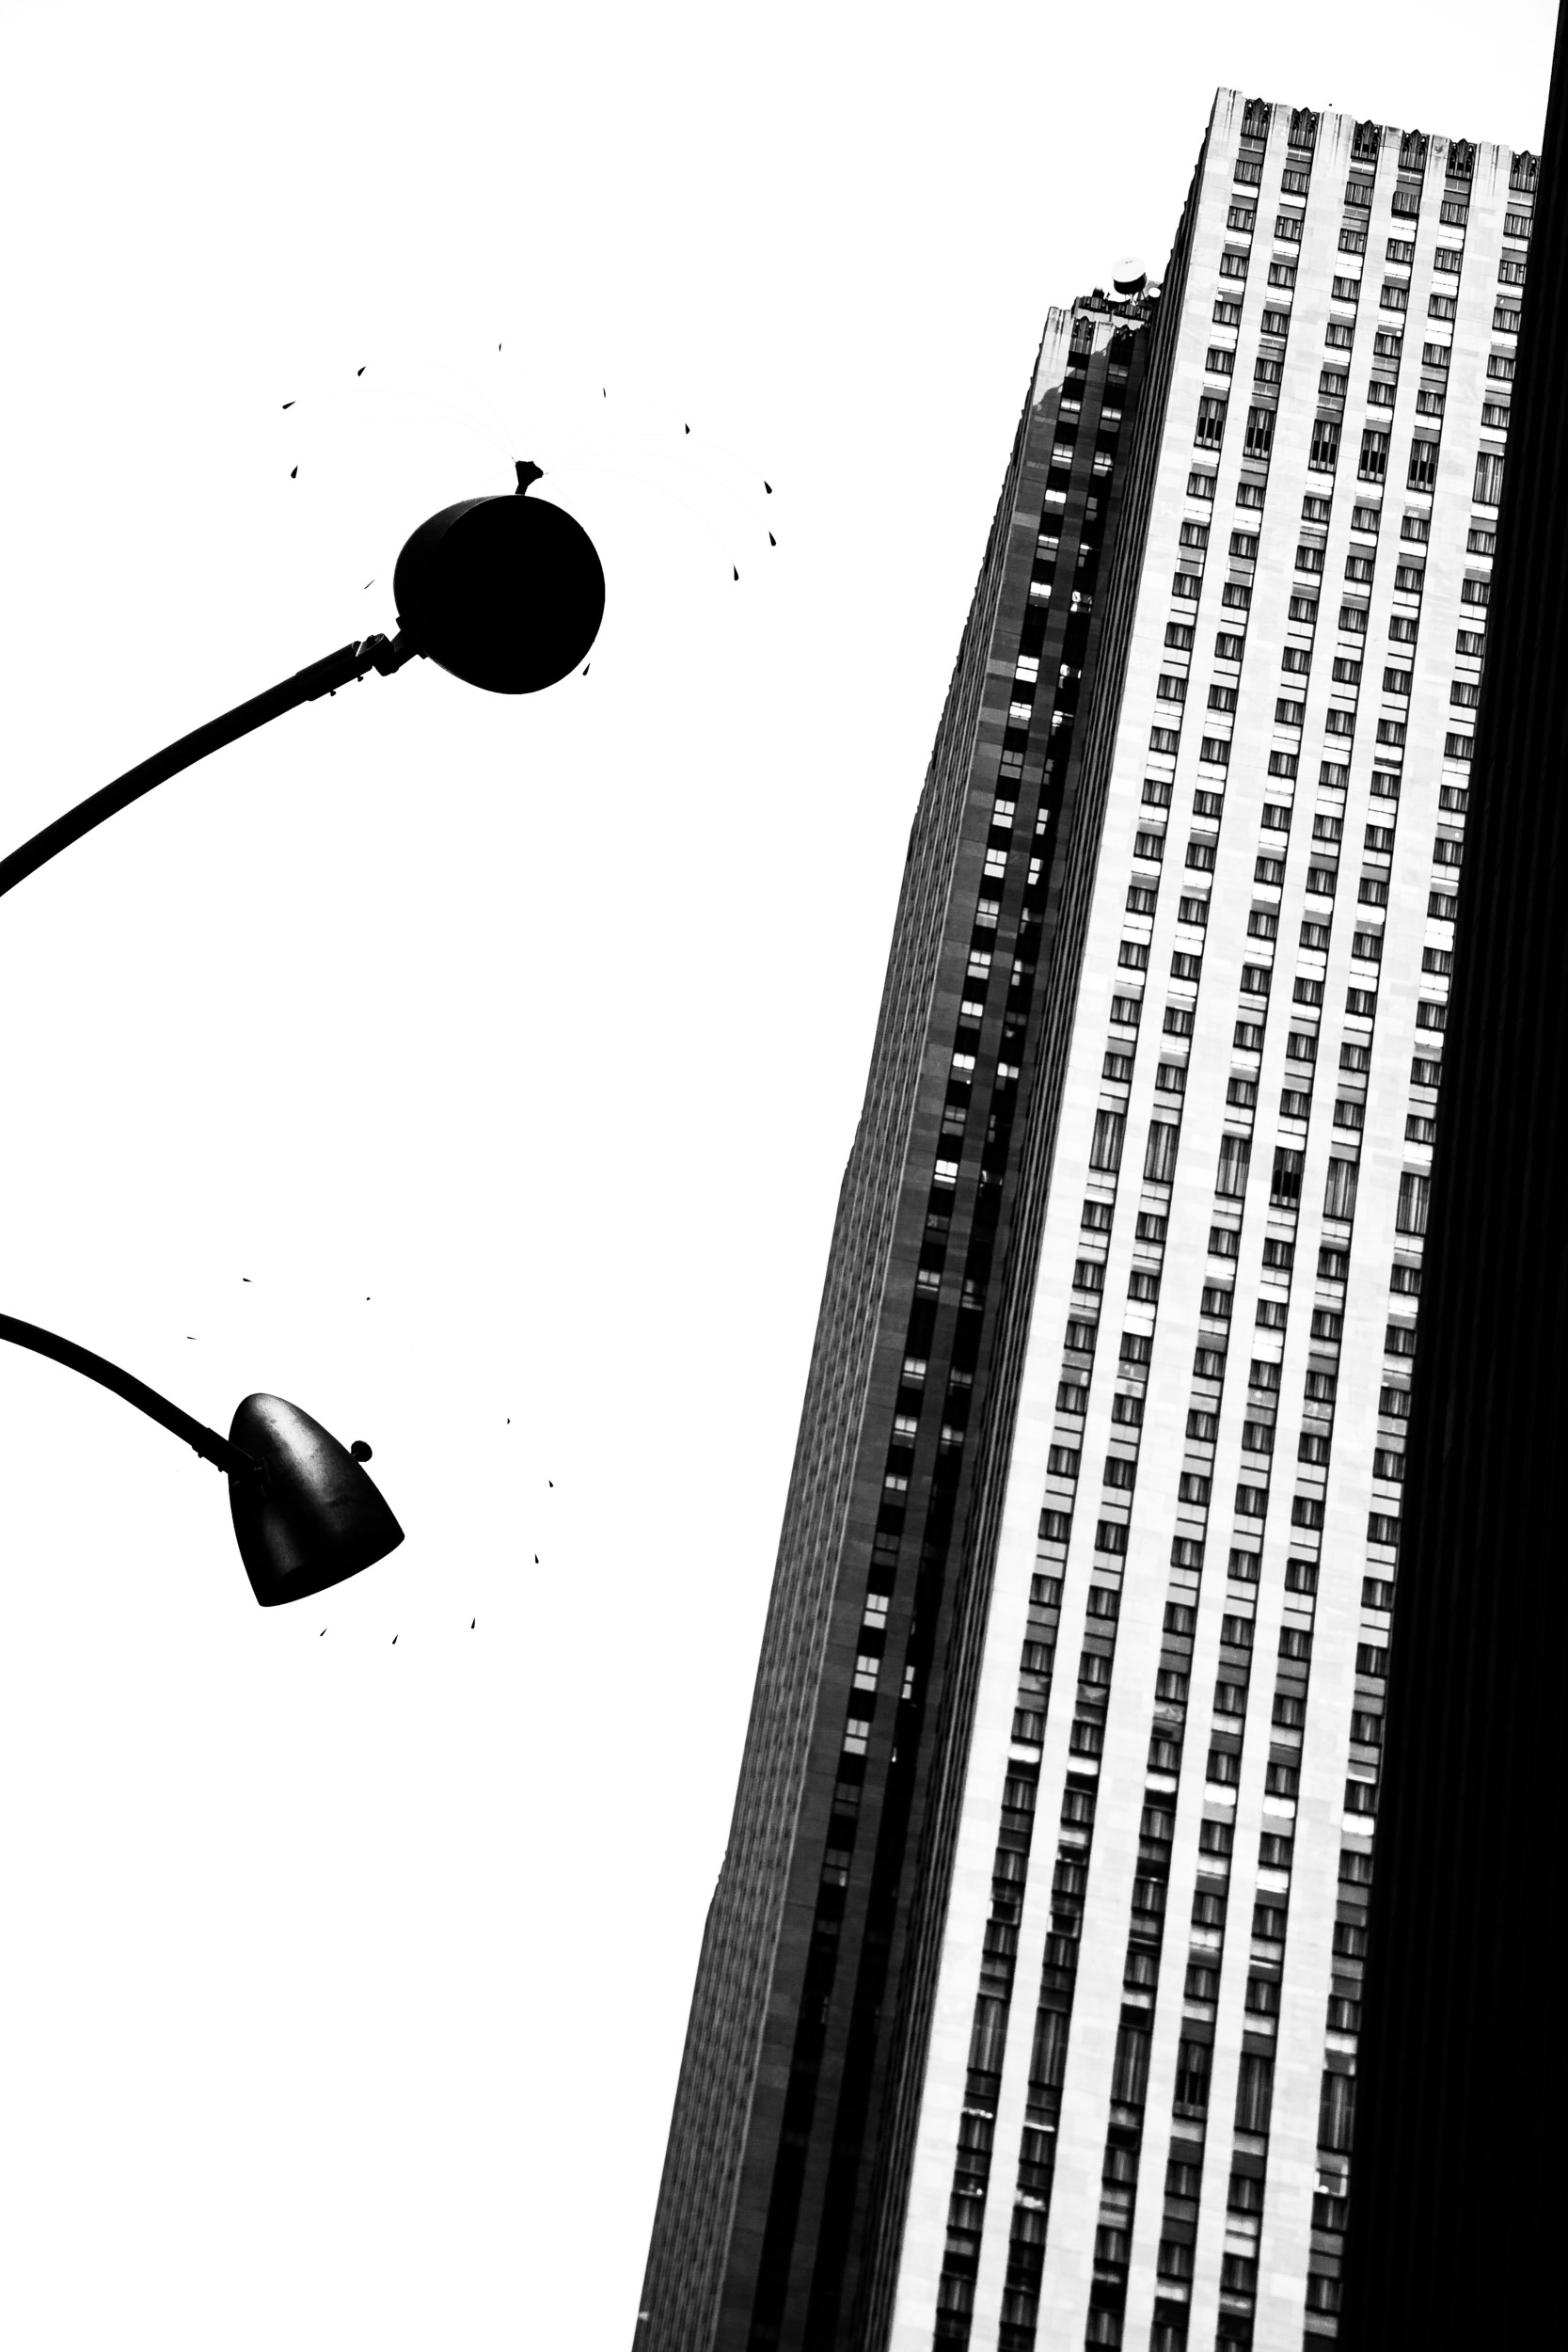 Streetlights of New York #52 New York, NY 2010